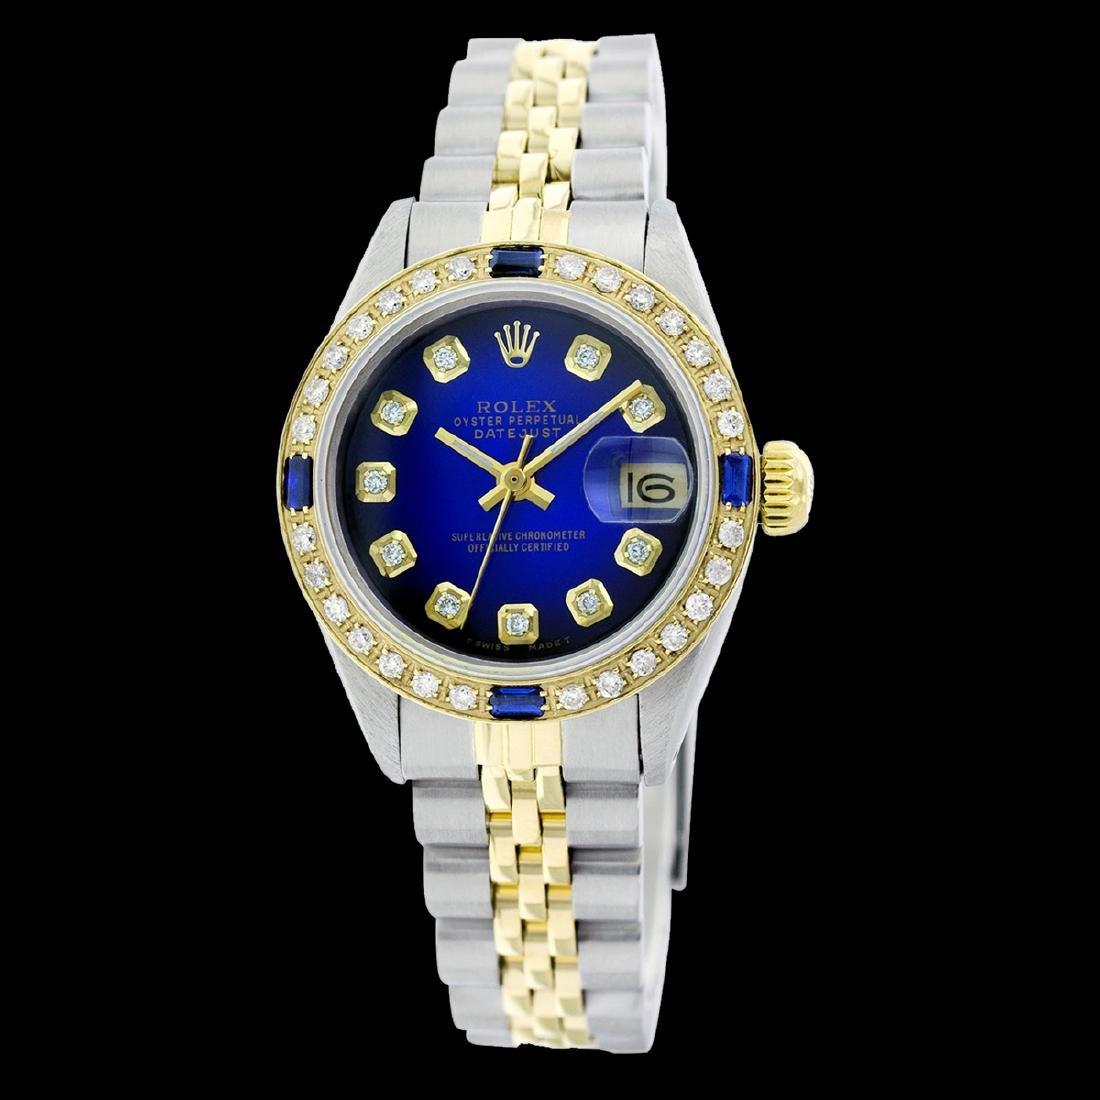 Rolex Men's Stainless Steel, QuickSet, Diam Dial &